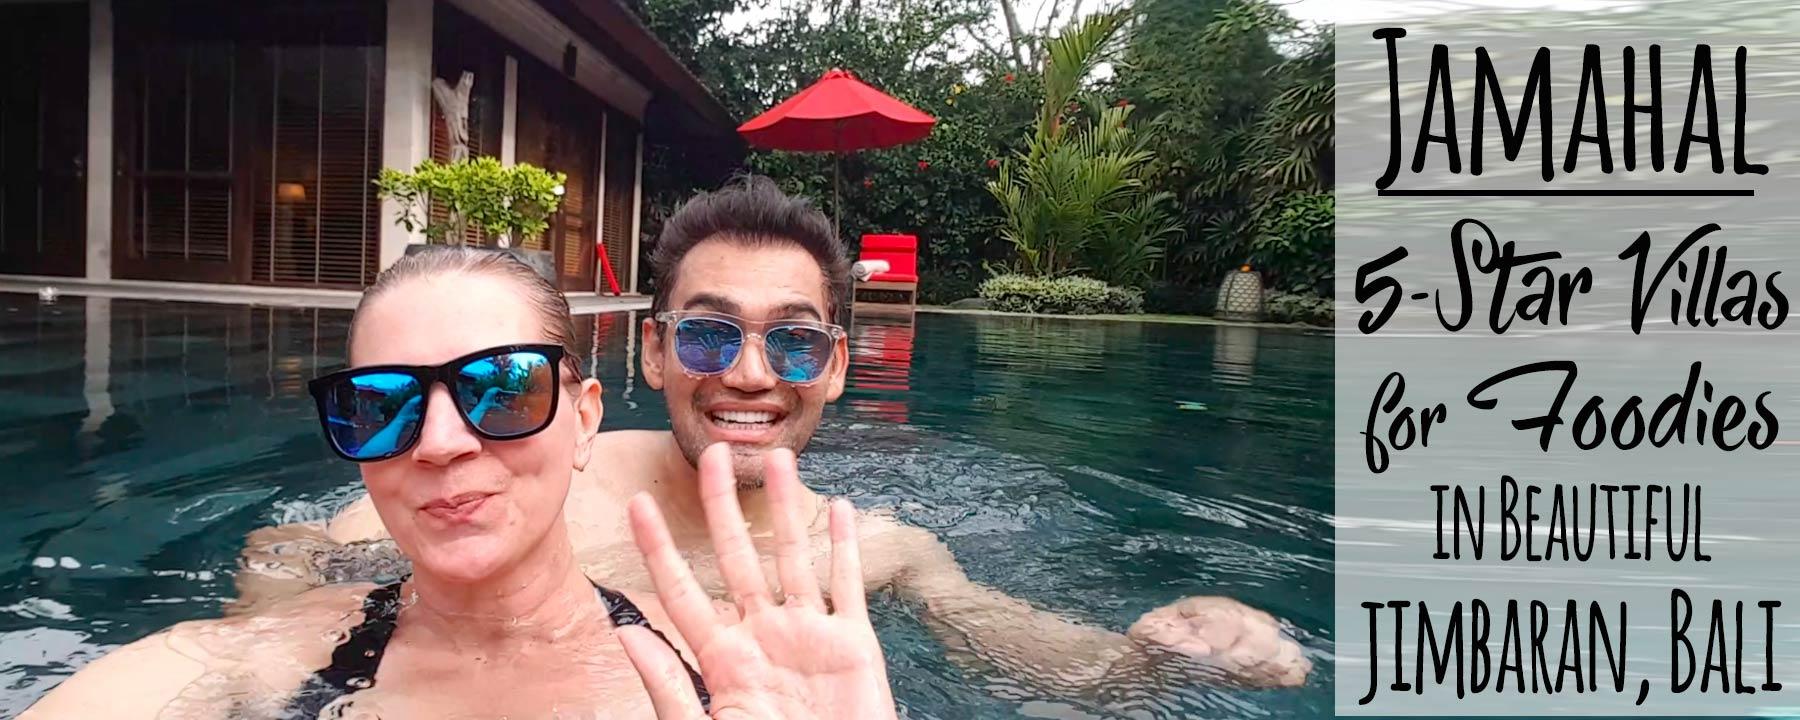 Bali's Jamahal Resort & Spa, Foodie-Fabulous 5-Star Villas Near Jimbaran Beach